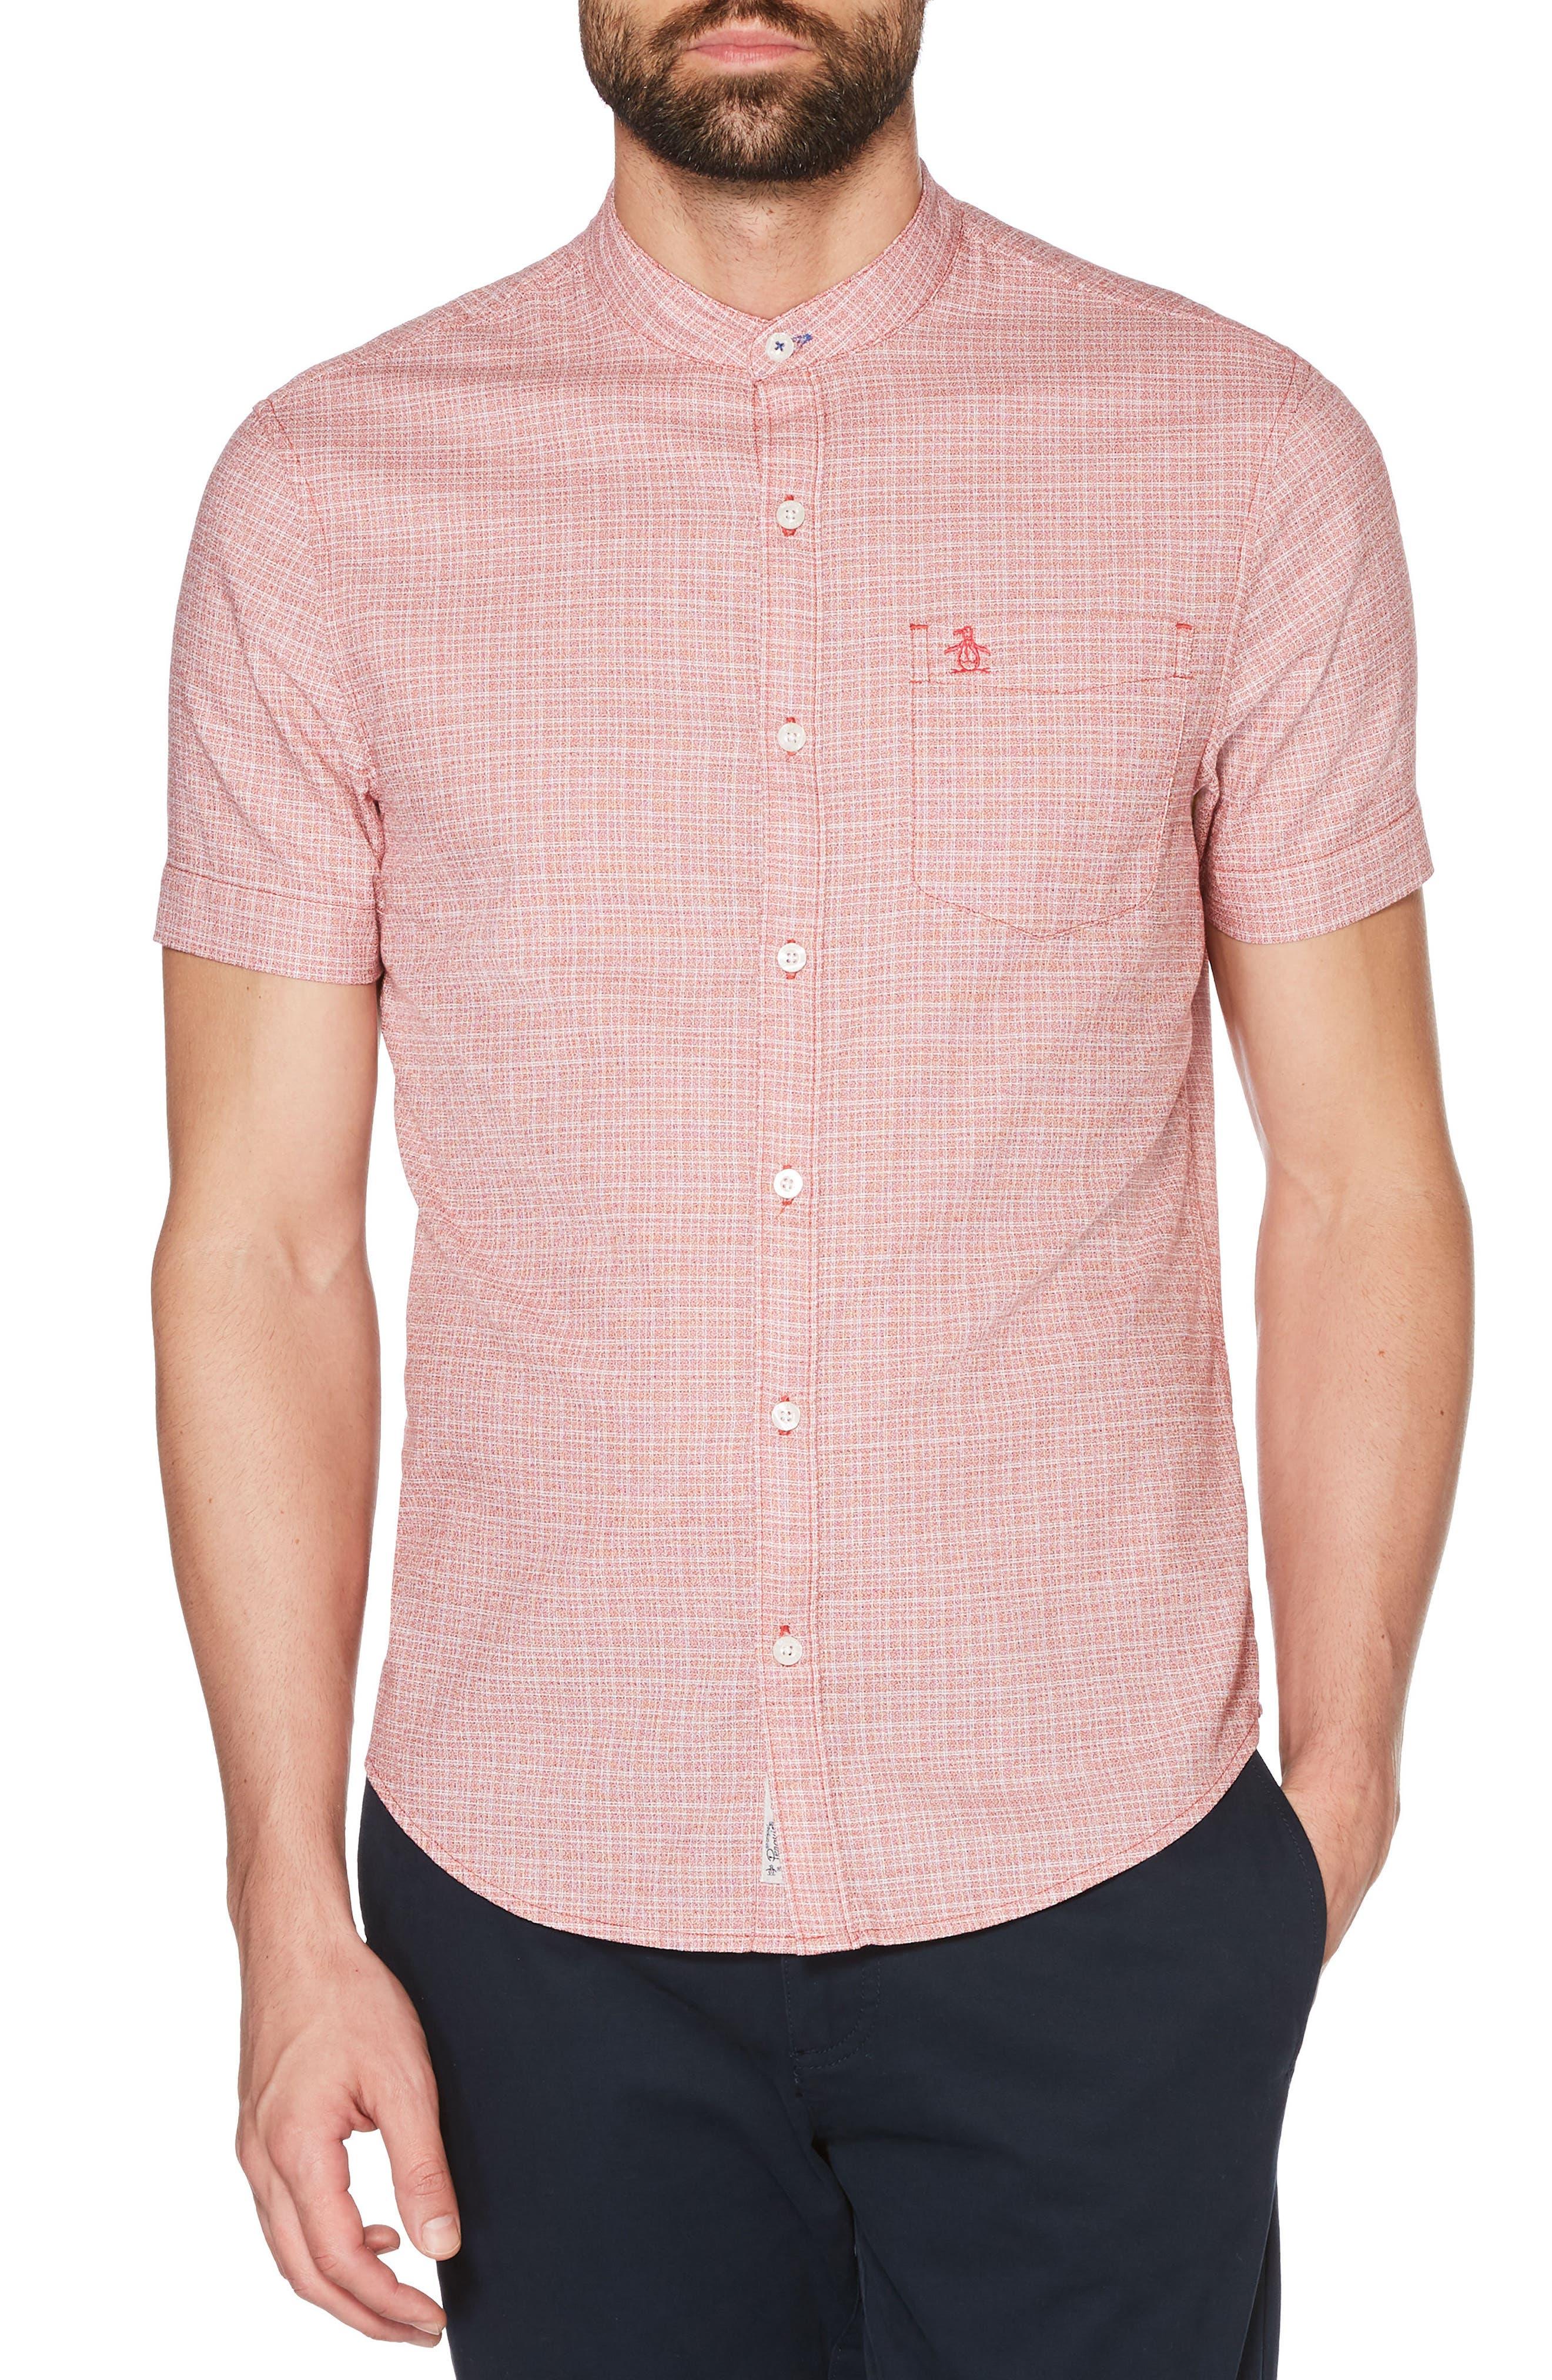 Crosshatch Shirt,                             Main thumbnail 1, color,                             660